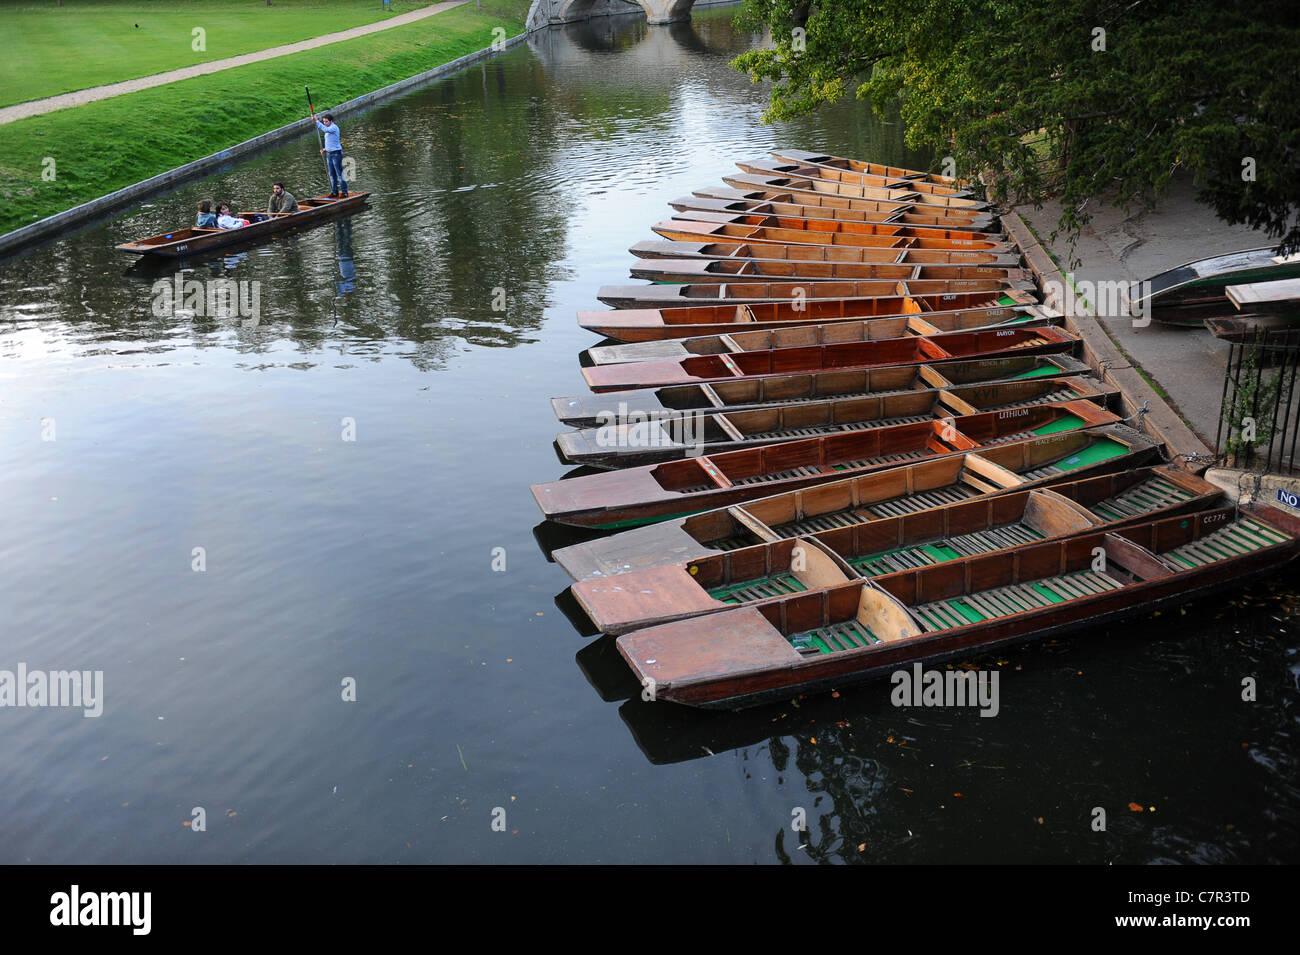 Punts moored at Cambridge England Uk - Stock Image